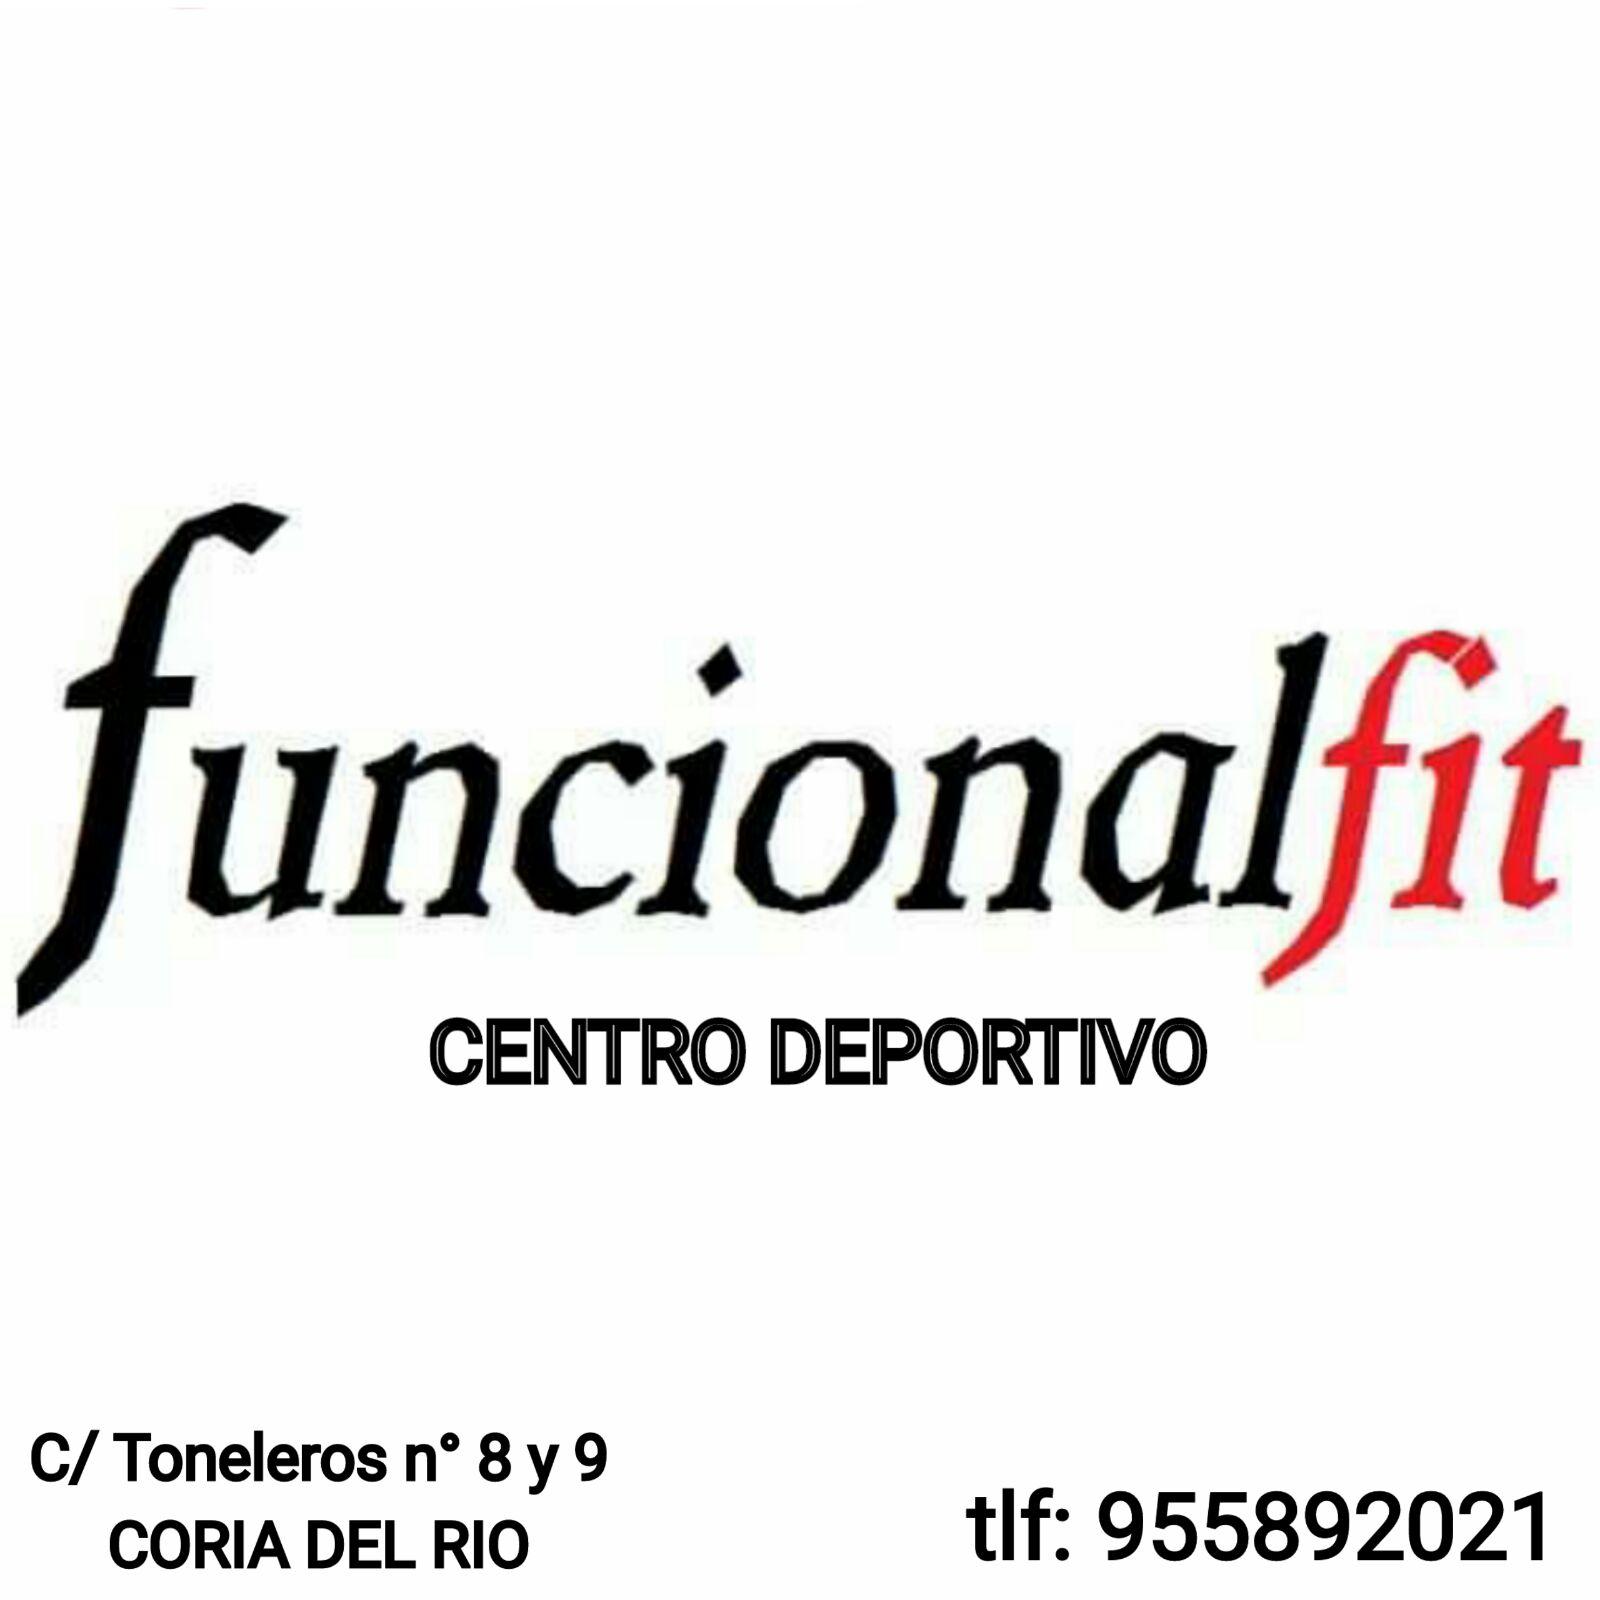 Centro Deportivo Funcionalfit